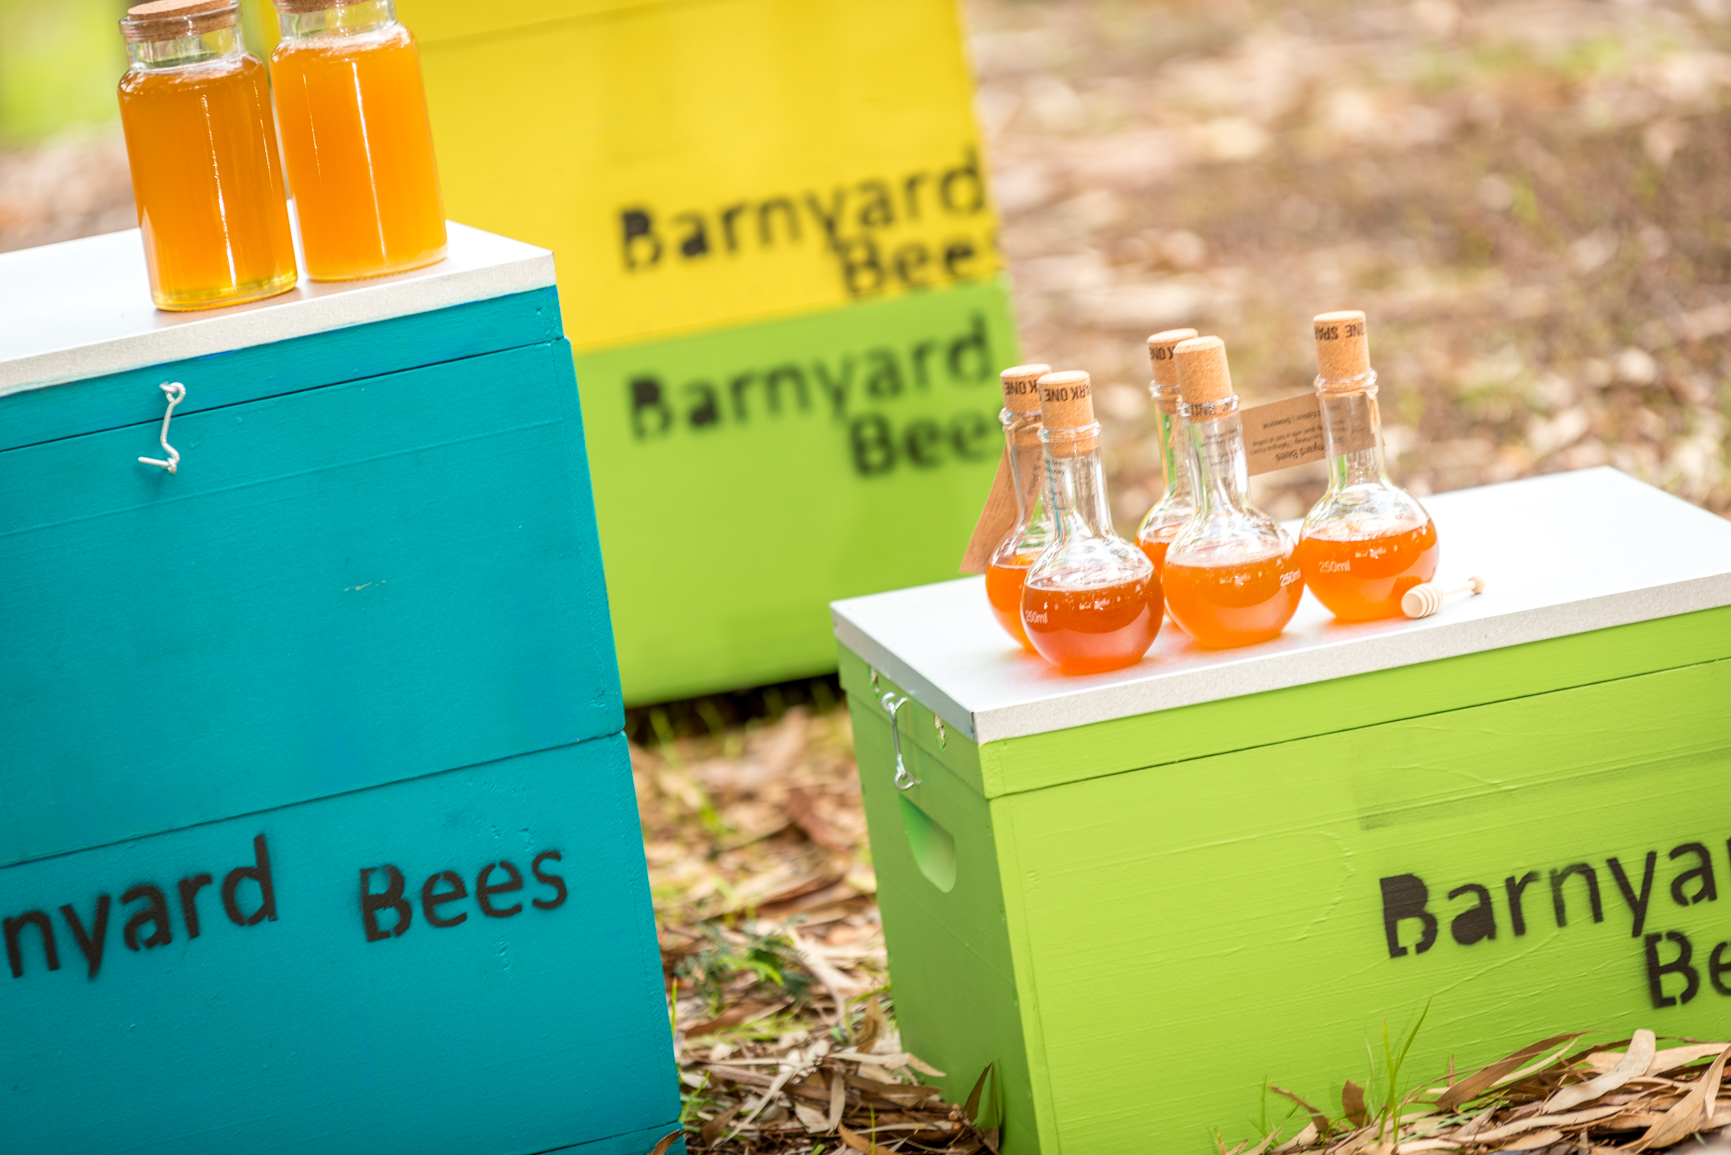 Barnyard beehives.jpg